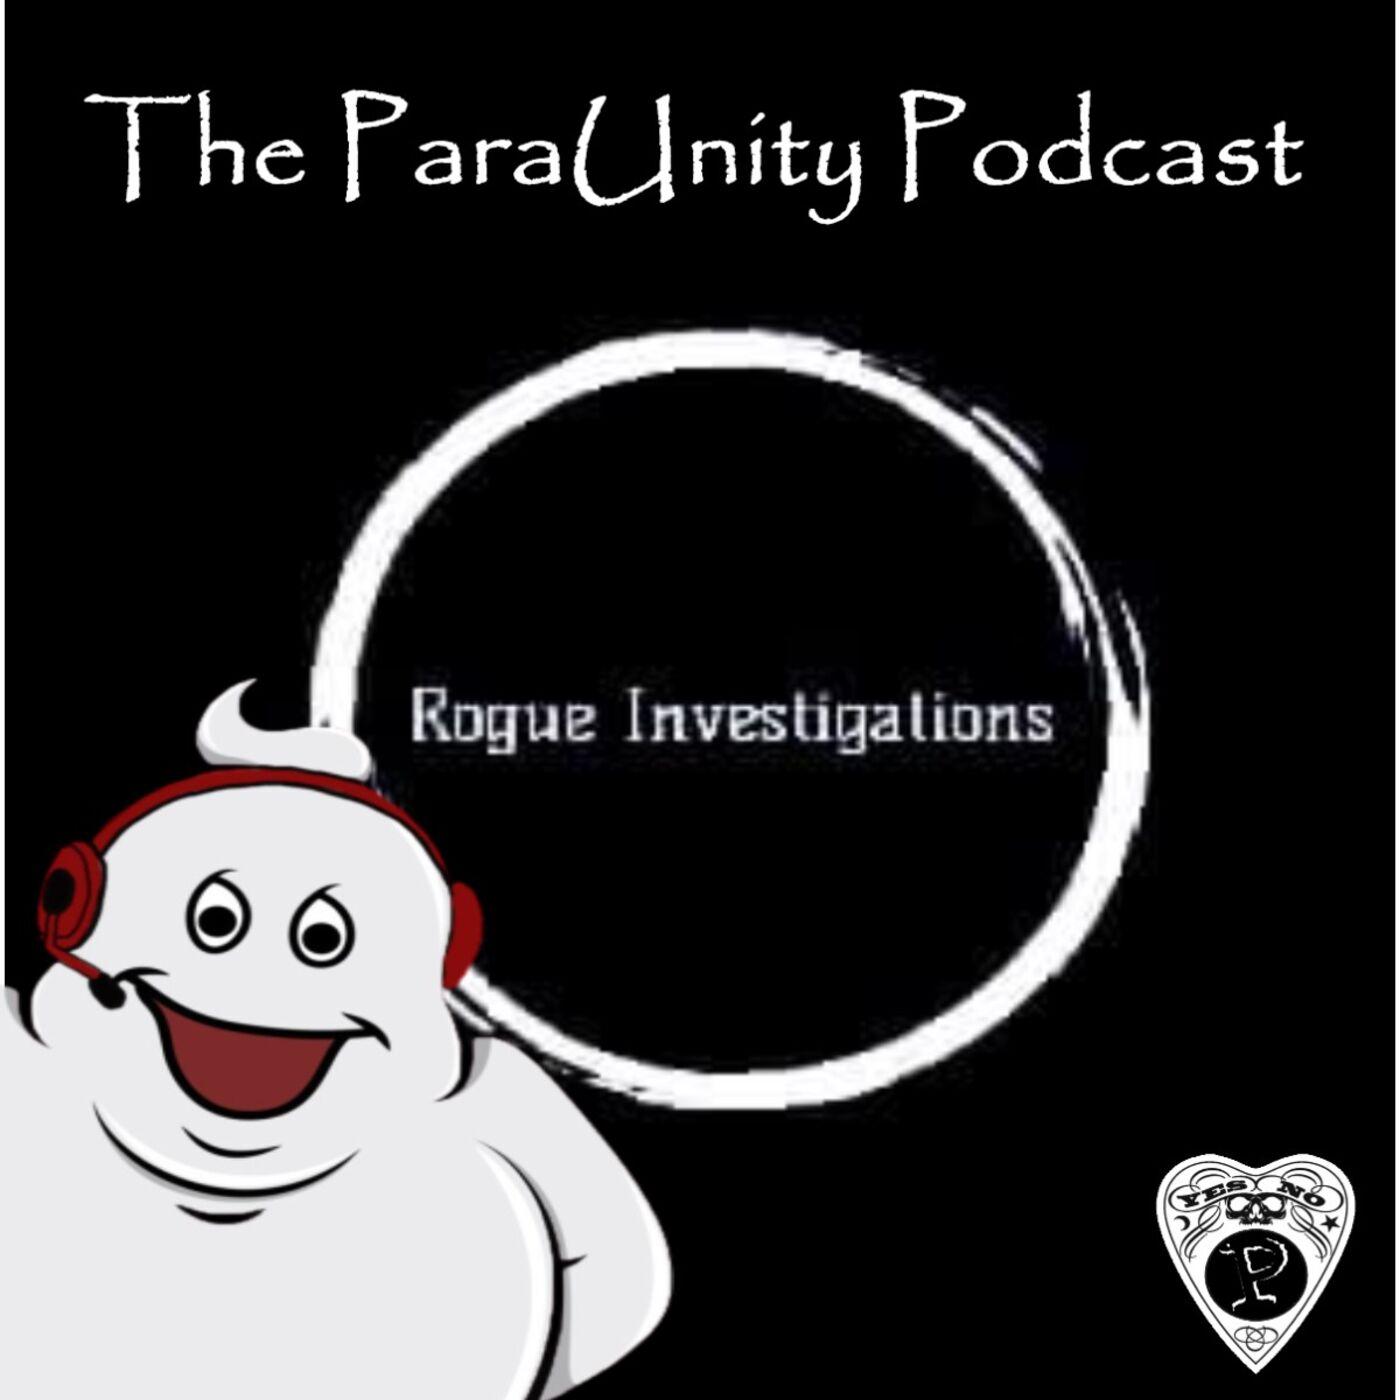 Episode 42 - Rogue Investigations